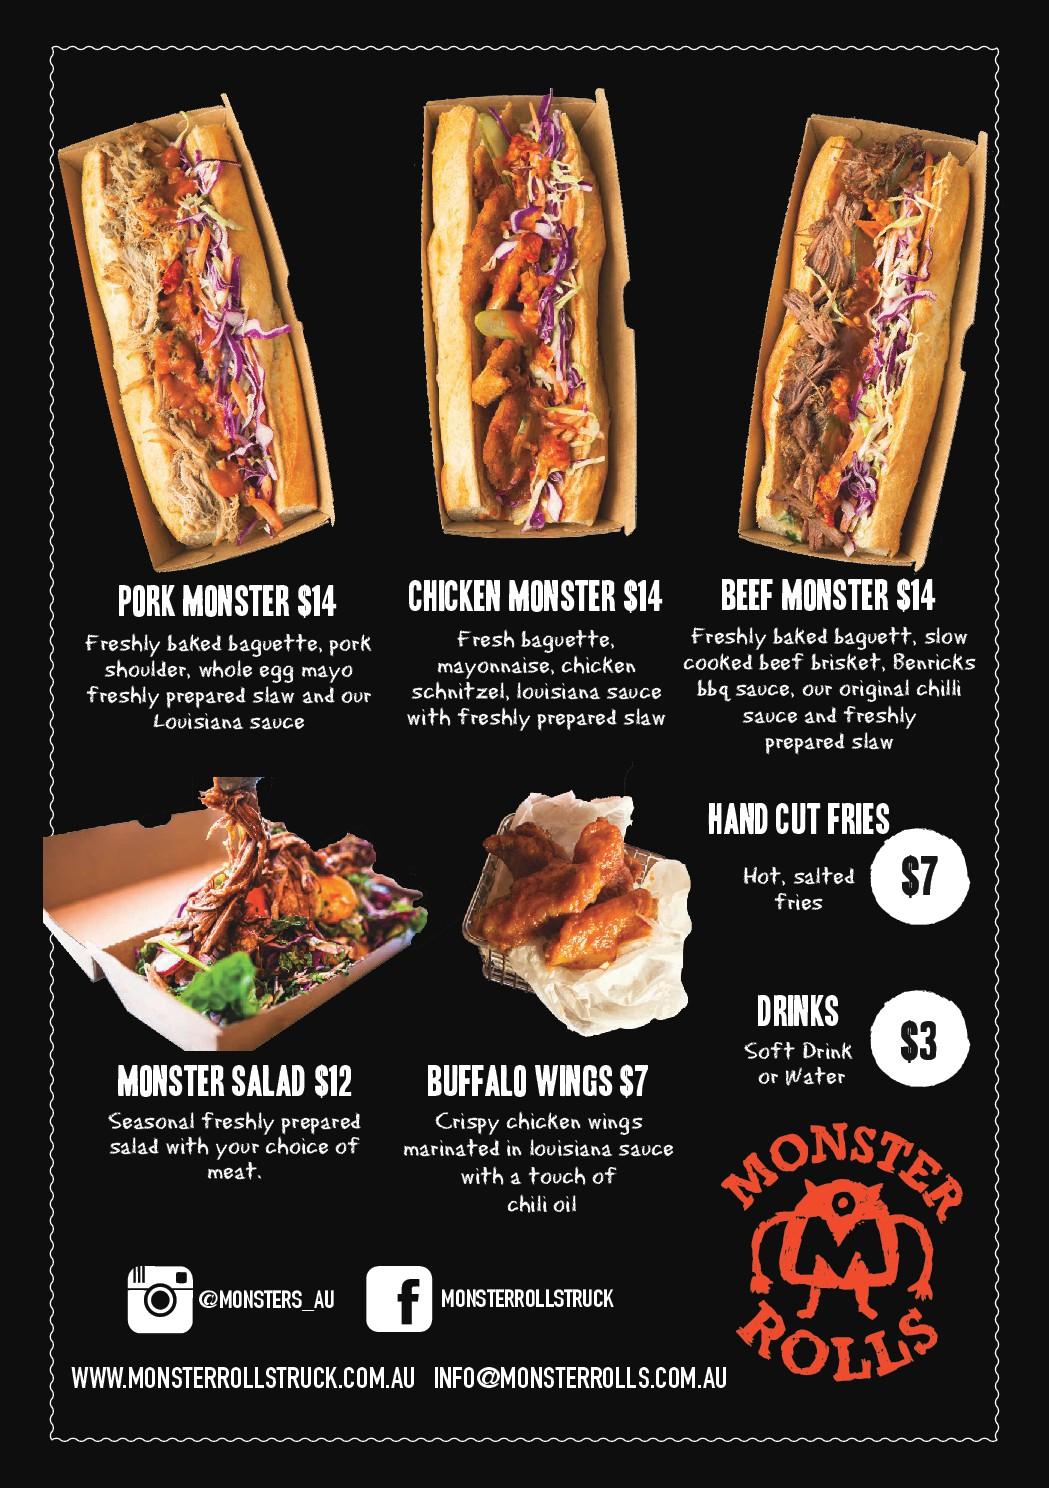 Monster Rolls Food Truck